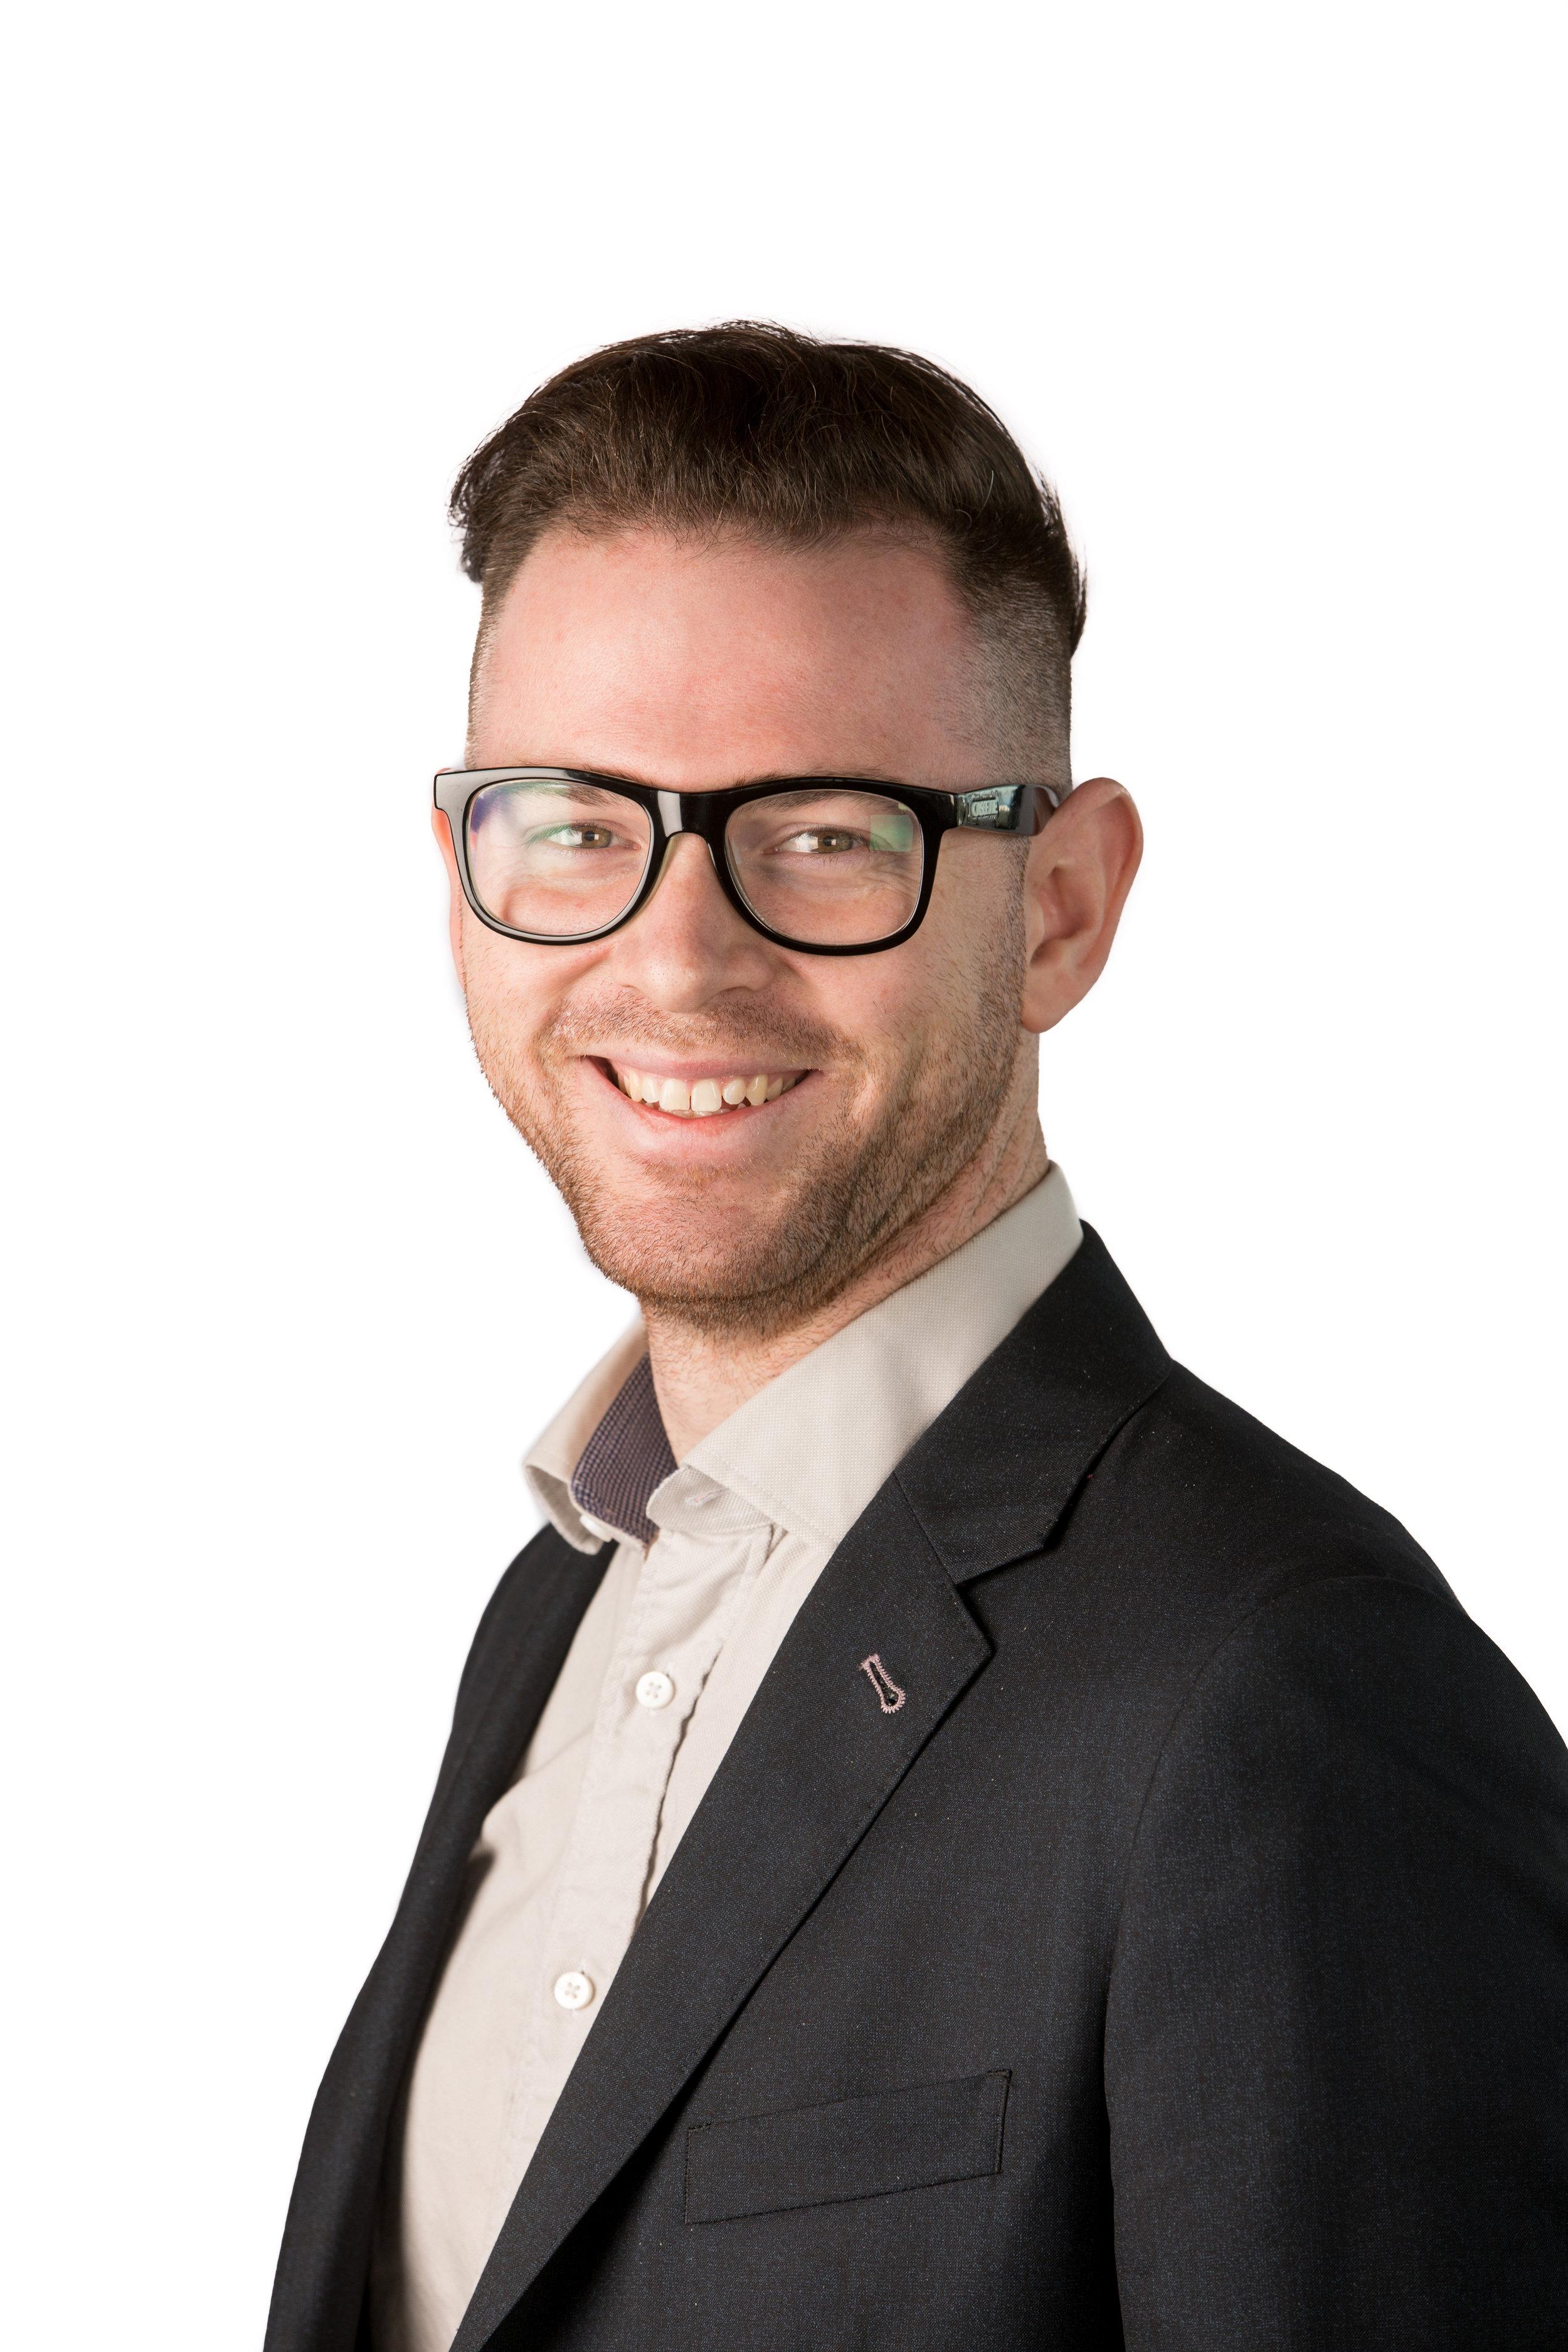 Graham Ruttan, Marketing and Communications Officer